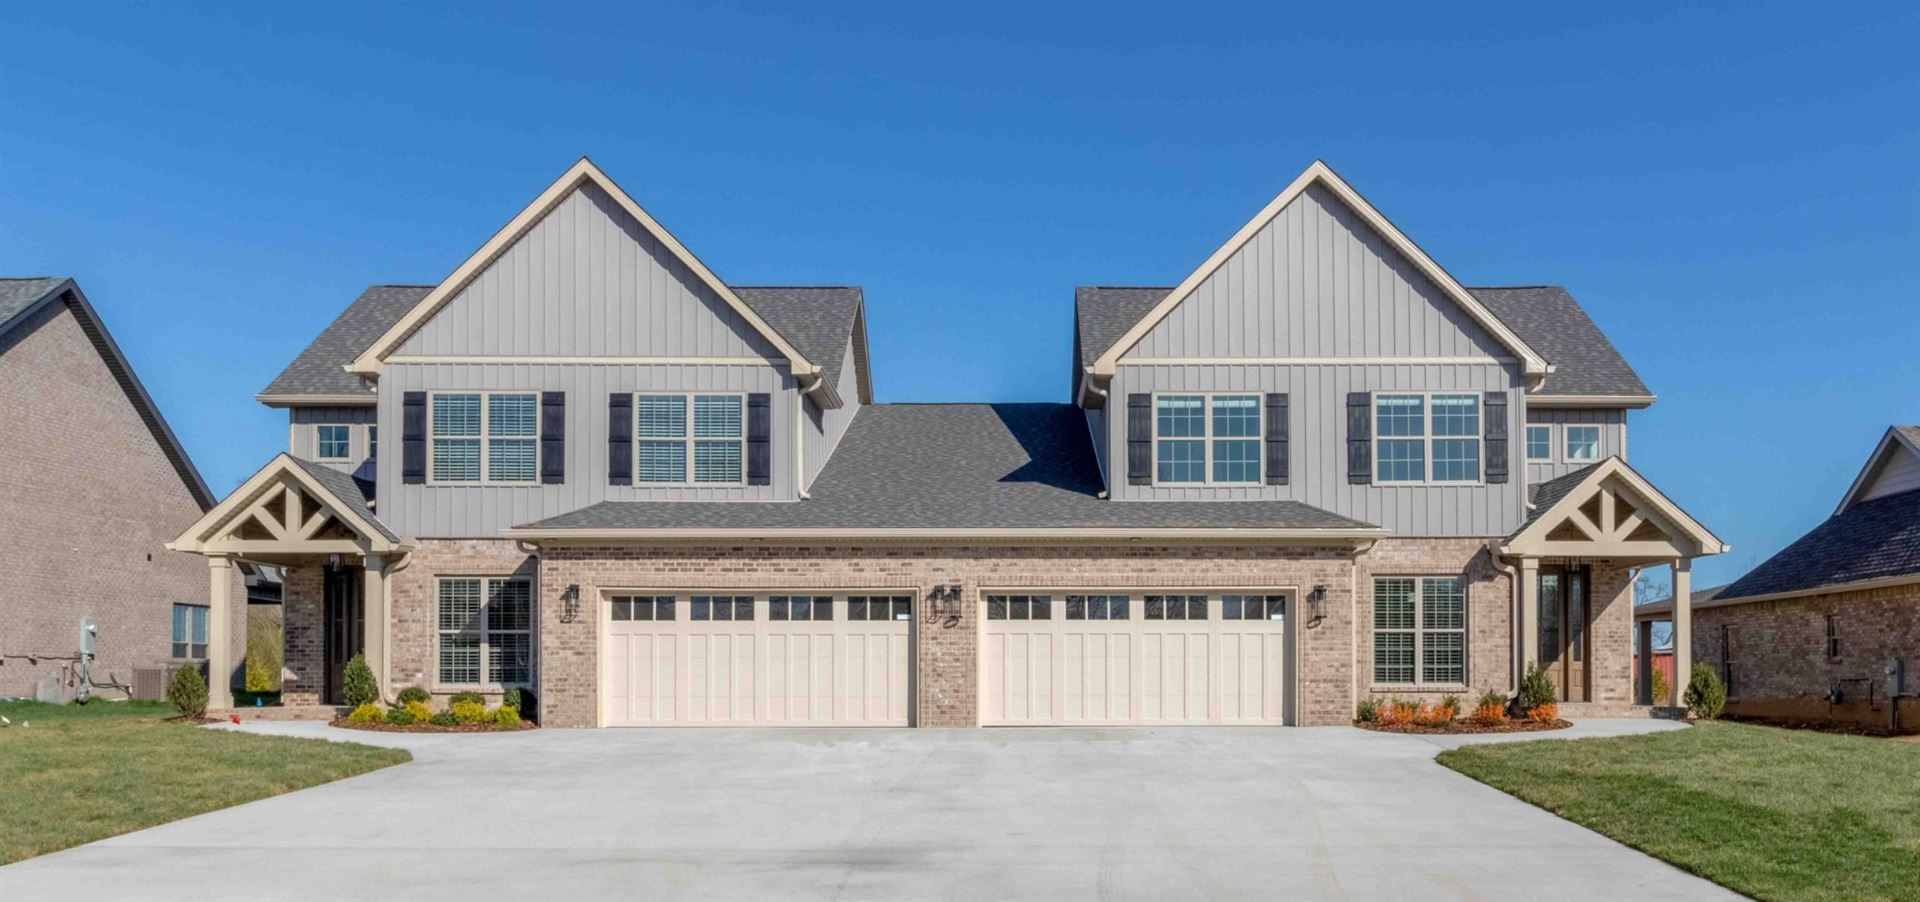 1089 Veridian Drive Unit 4A, Clarksville, TN 37043 - MLS#: 2274640